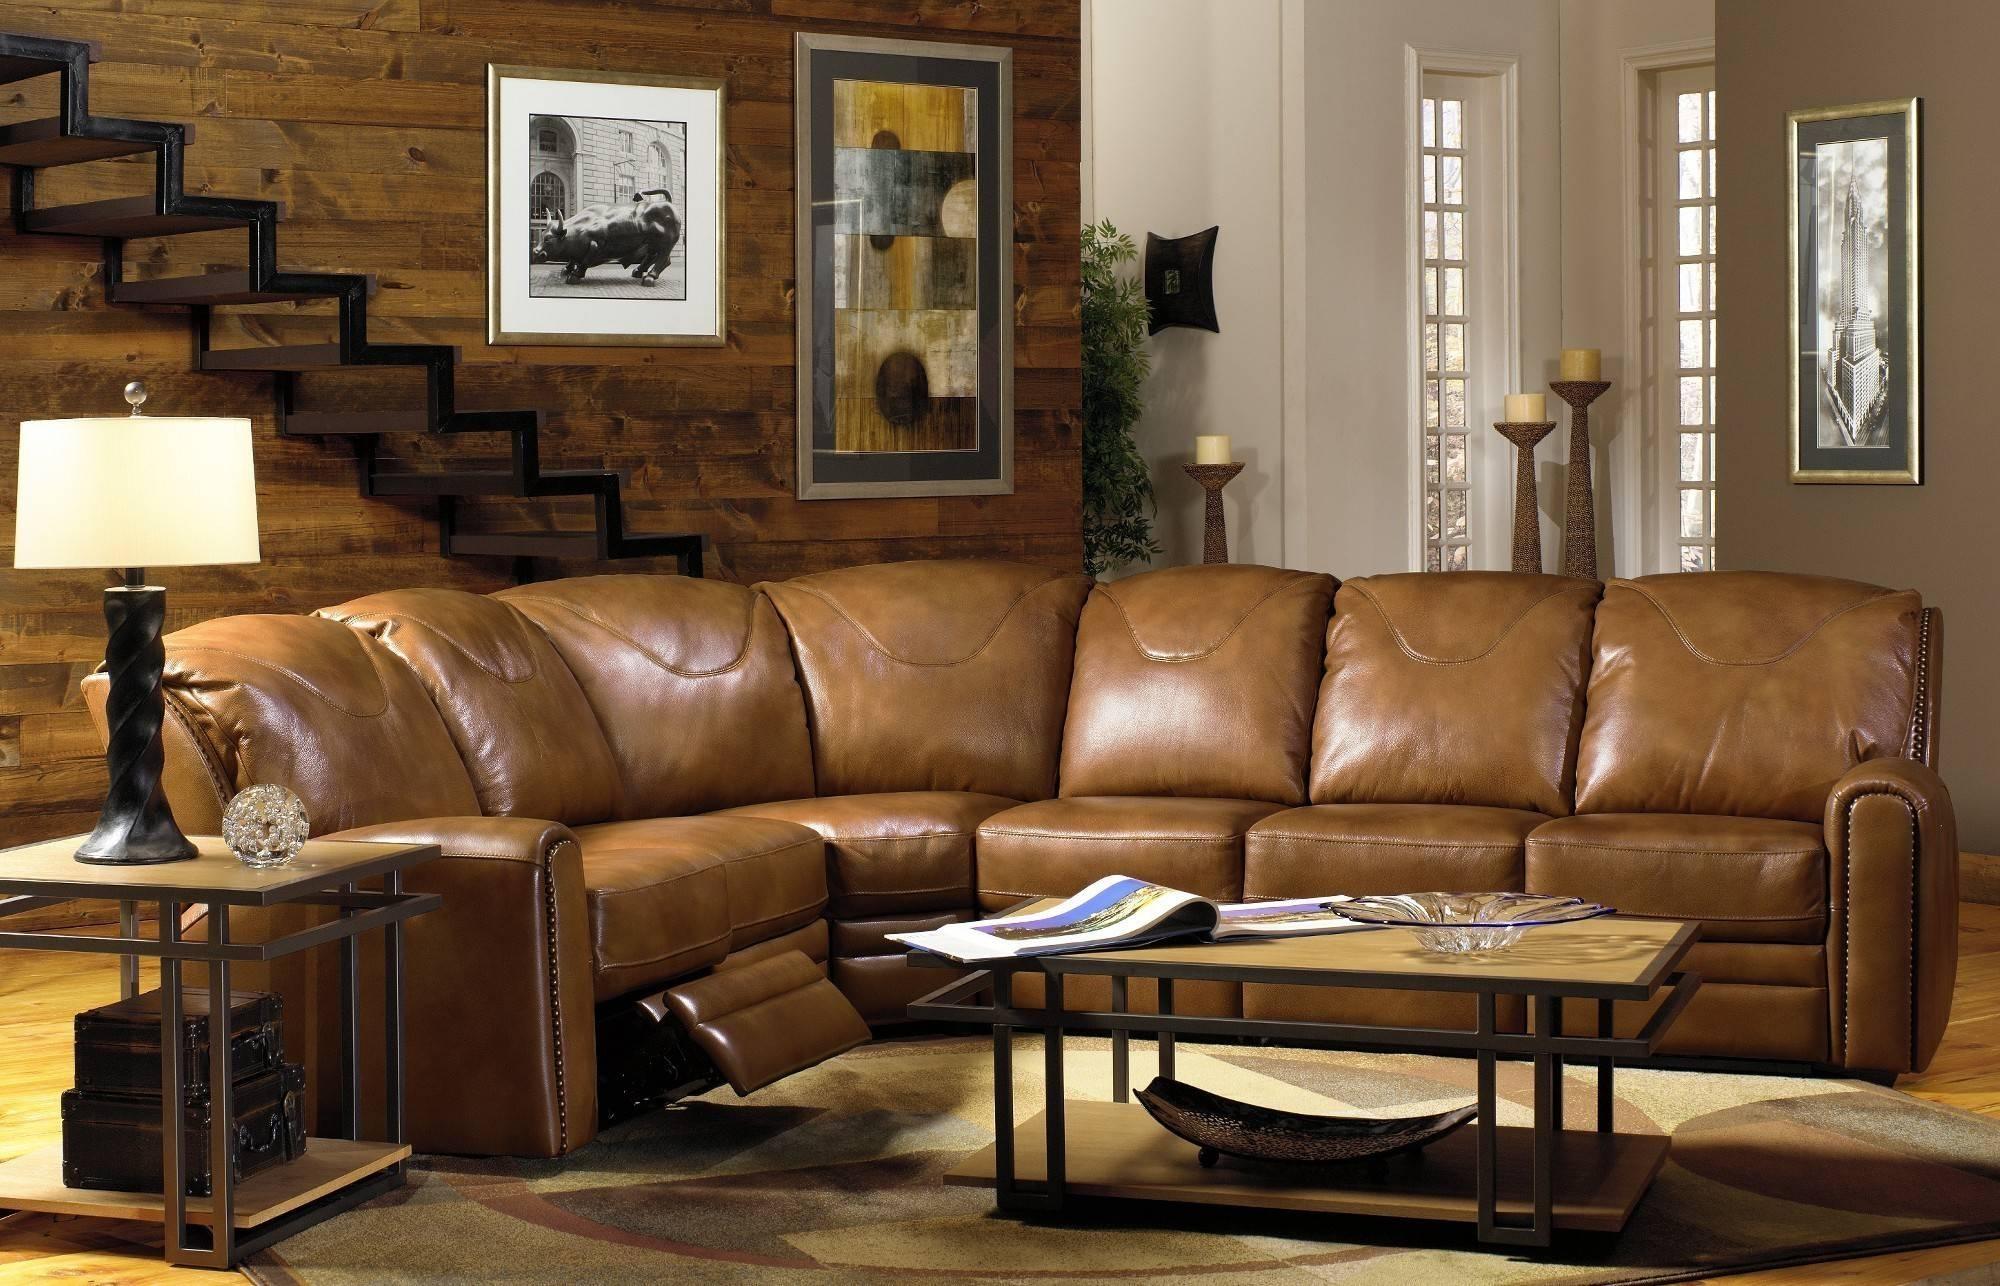 Sofas Center : Stirring Genuine Leather Sofa Set Images within European Leather Sofas (Image 27 of 30)